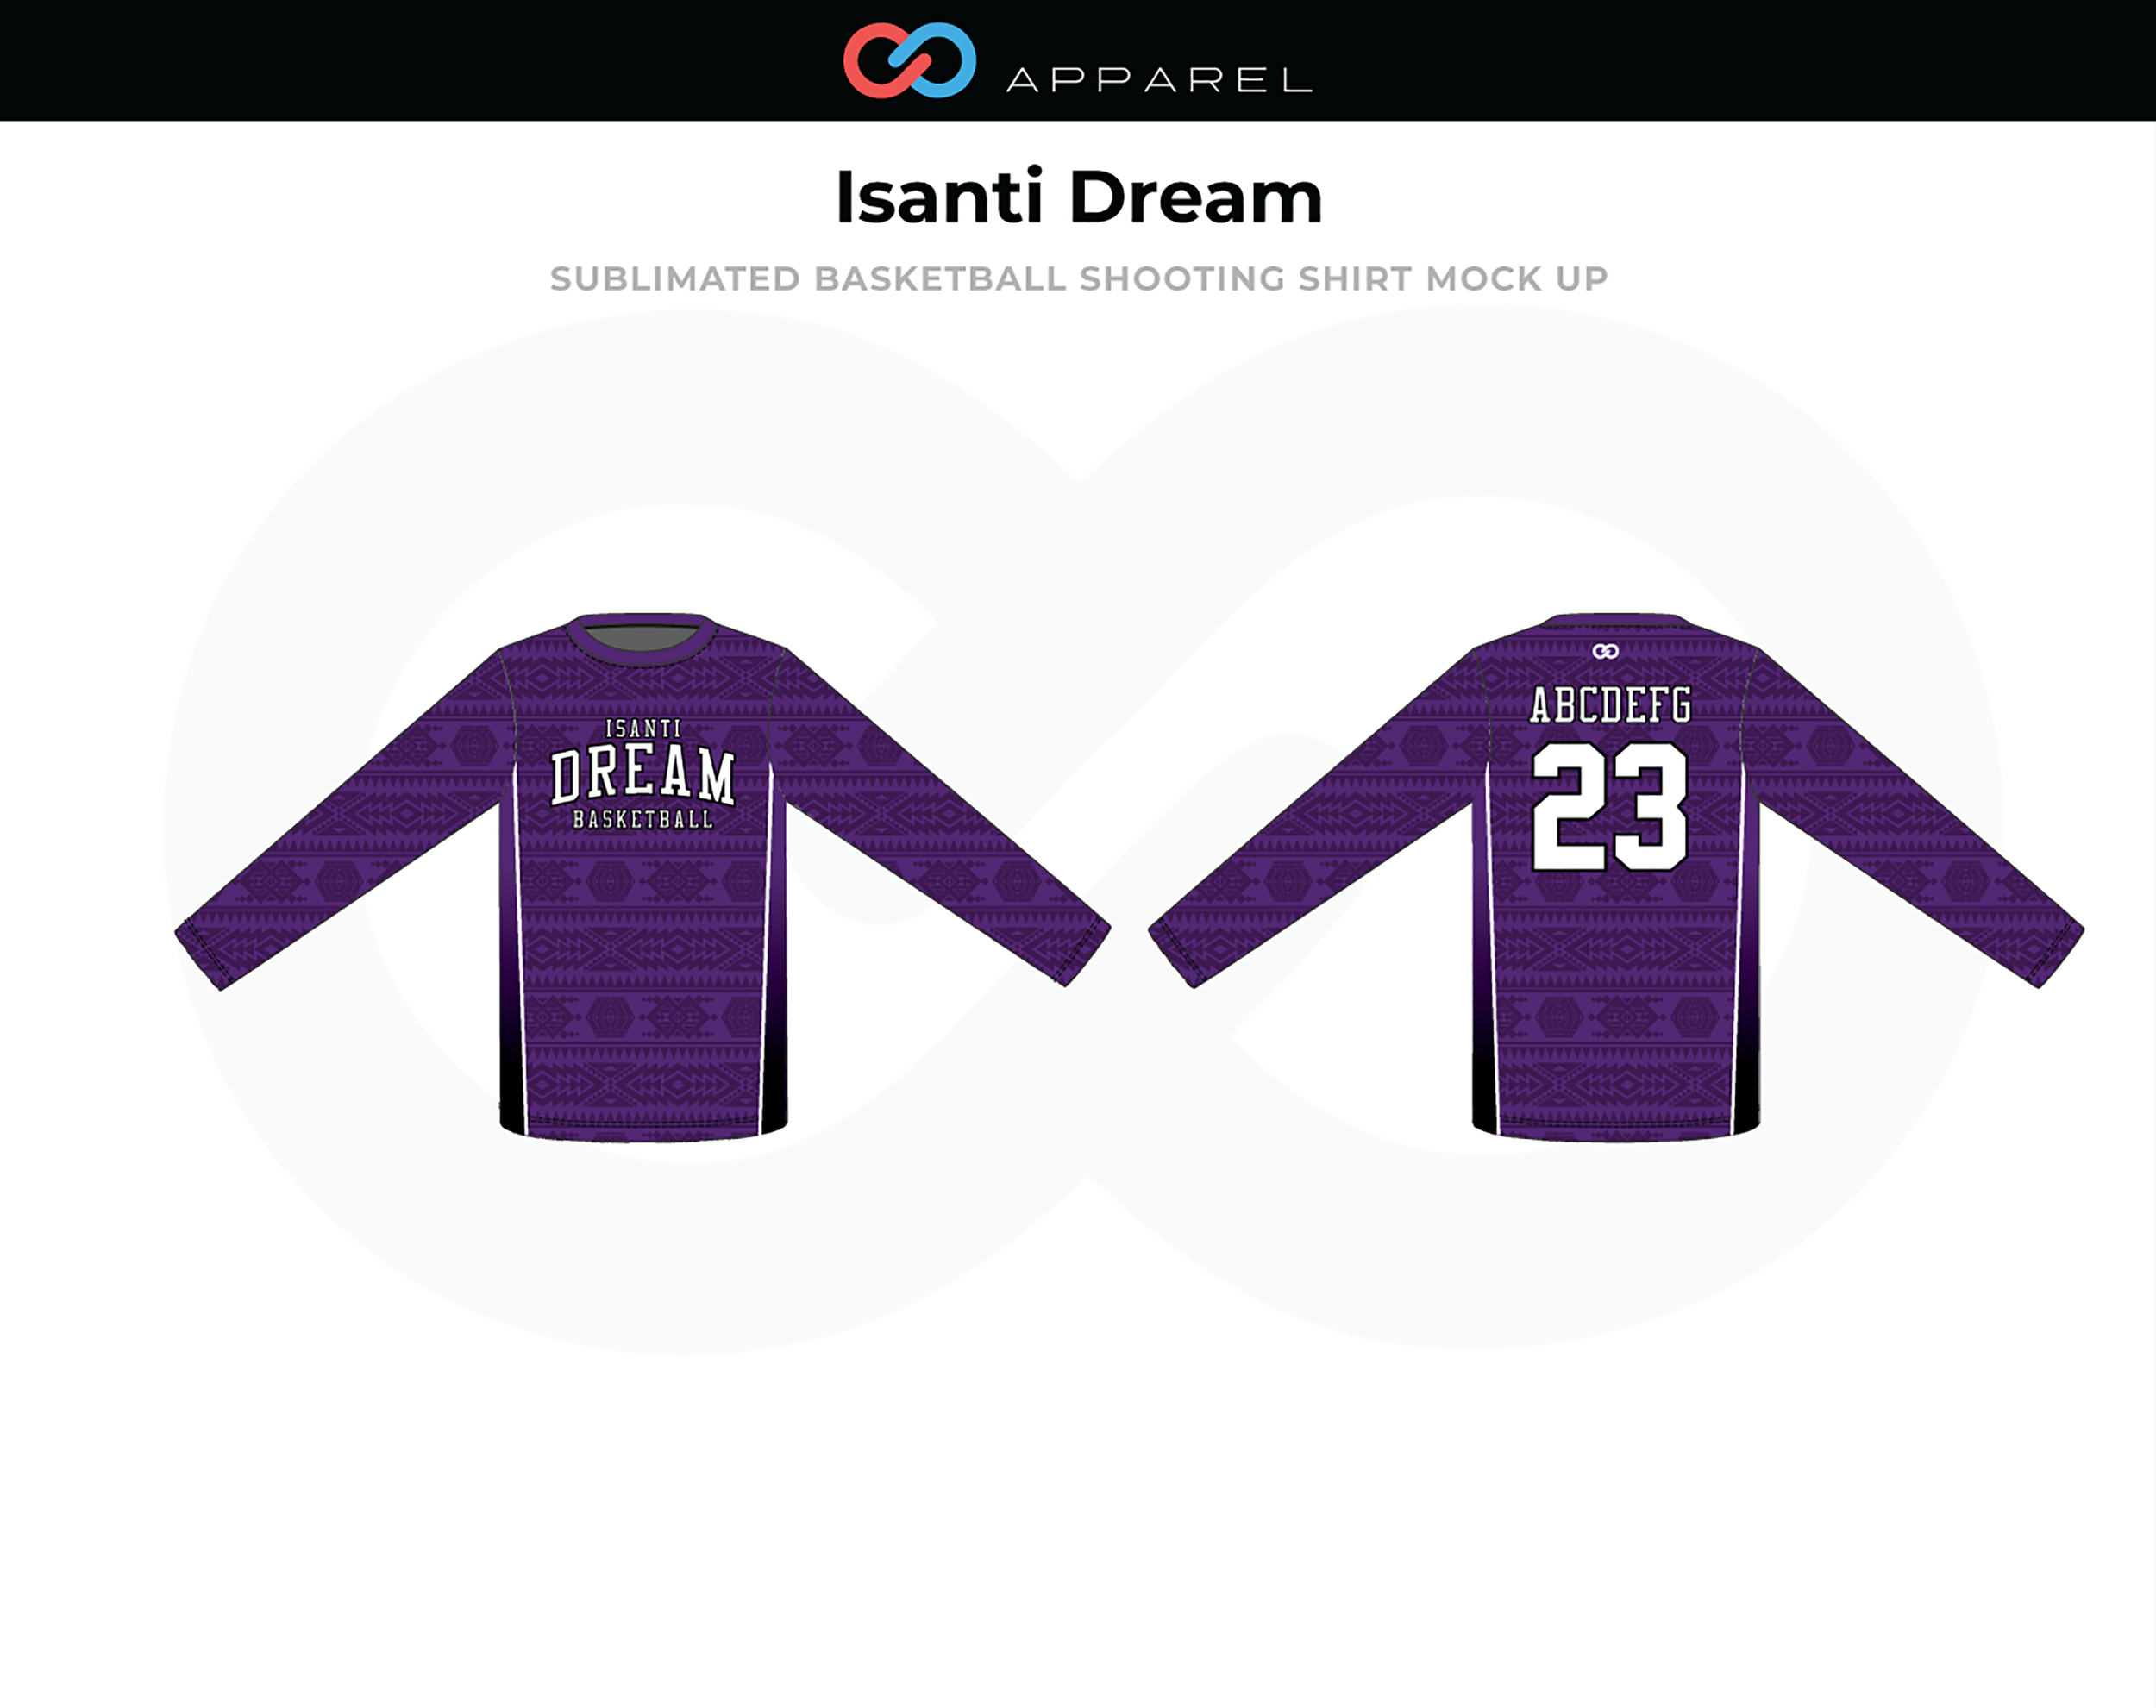 ISANTI DREAM Purple Basketball Shooting Shirt